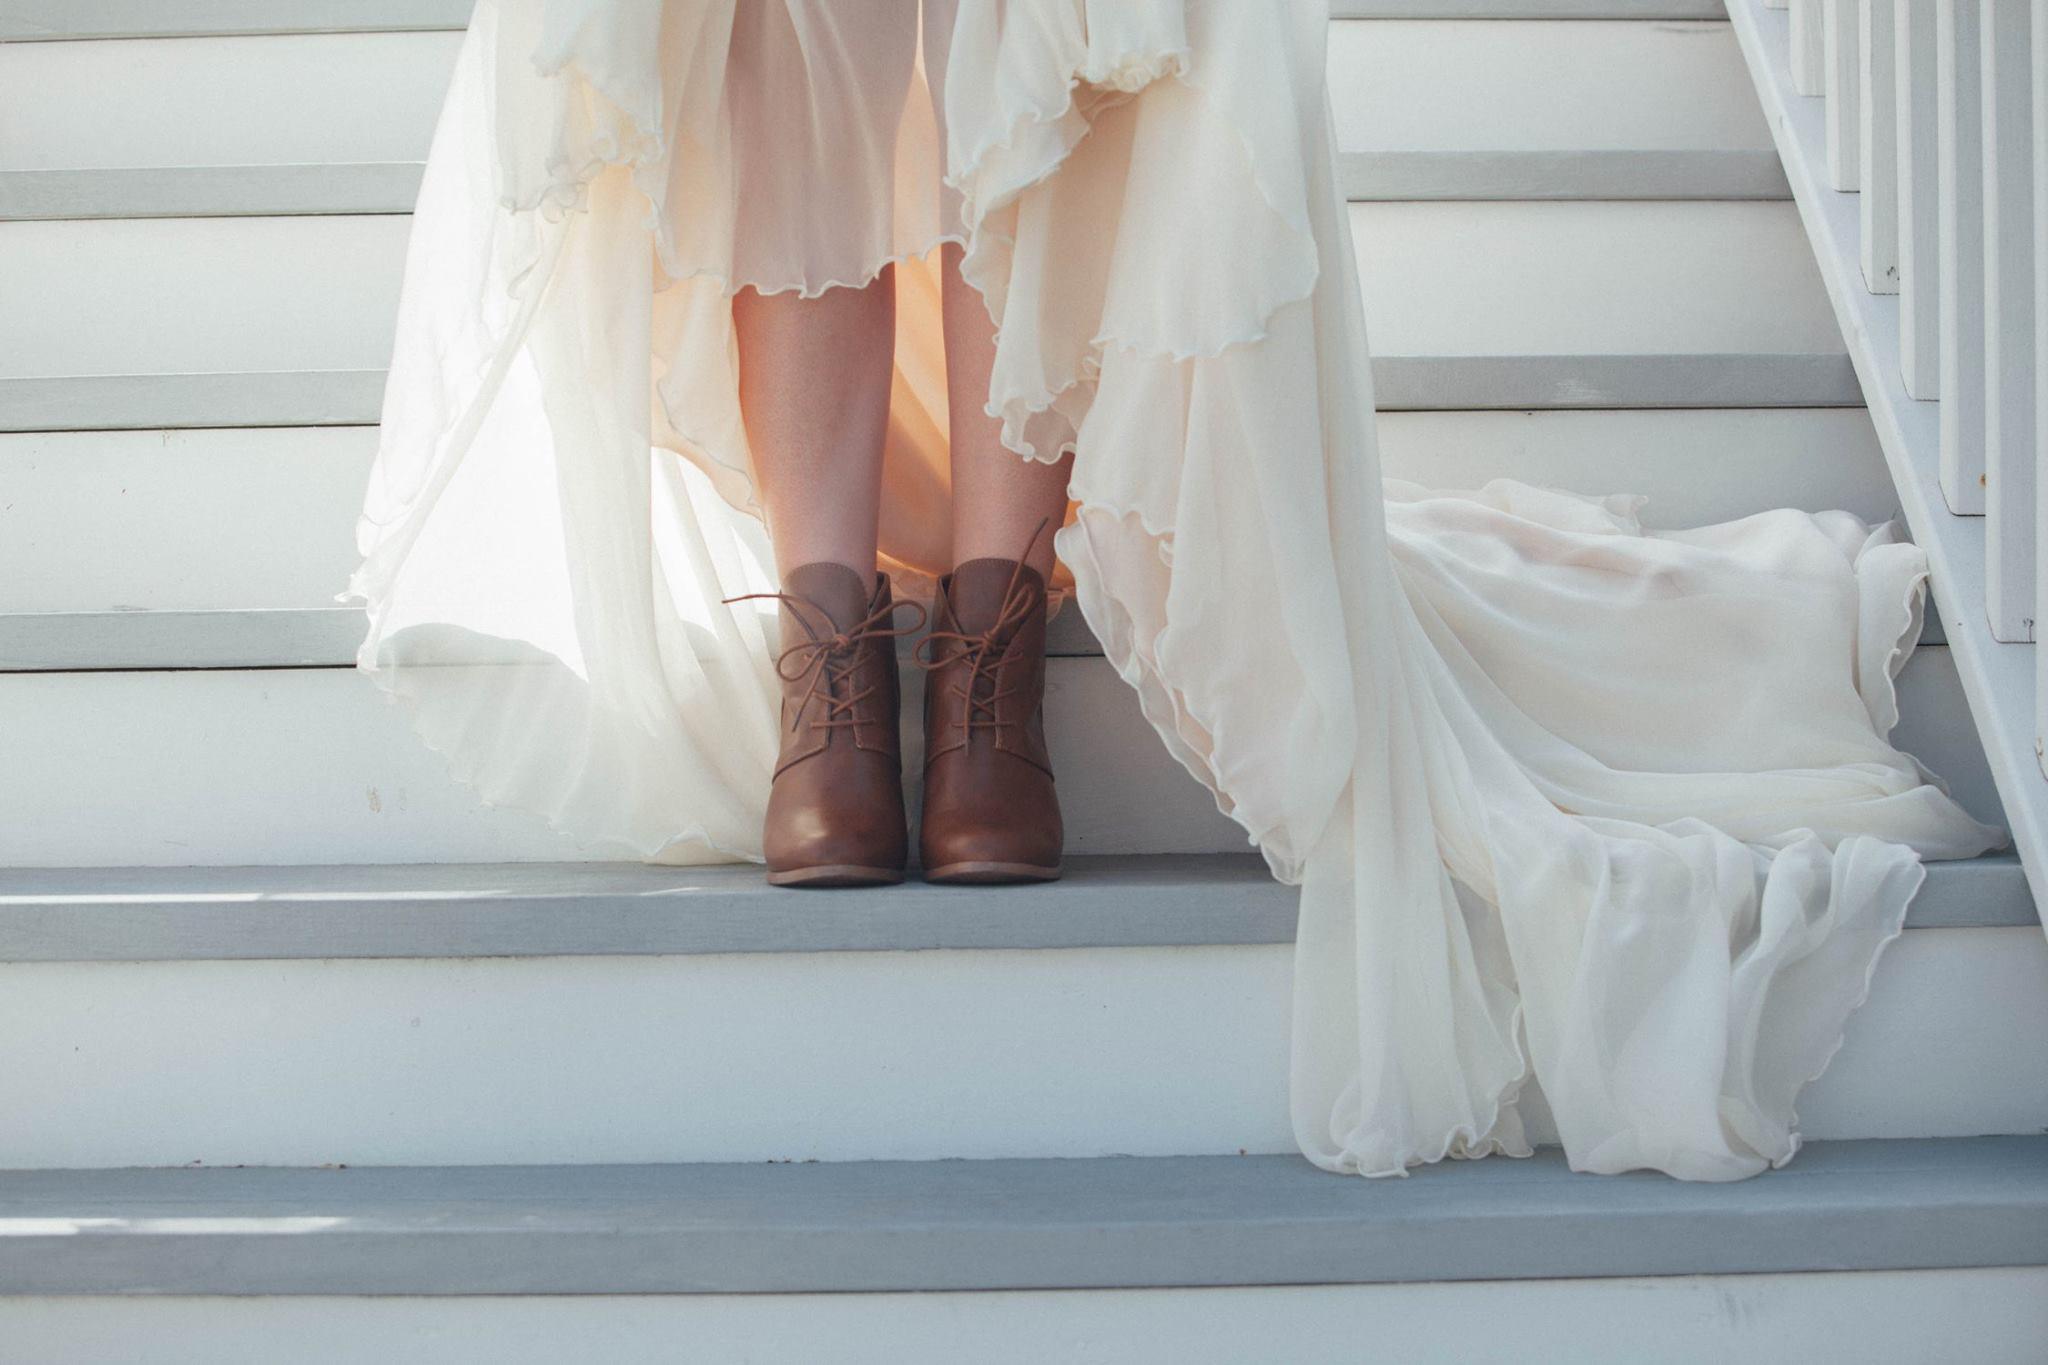 lindy-garvin-rebecca-schoneveld-vivian-sage-blush-wedding-dress-blush-bridal-gown-handmade-wedding-dress-ivory-and-beau-bridal-boutique-savannah-wedding-dresses-savannah-bridal-boutique-savannah-weddings-savannah-brides-jacksonville-bridal-boutique-4.jpg